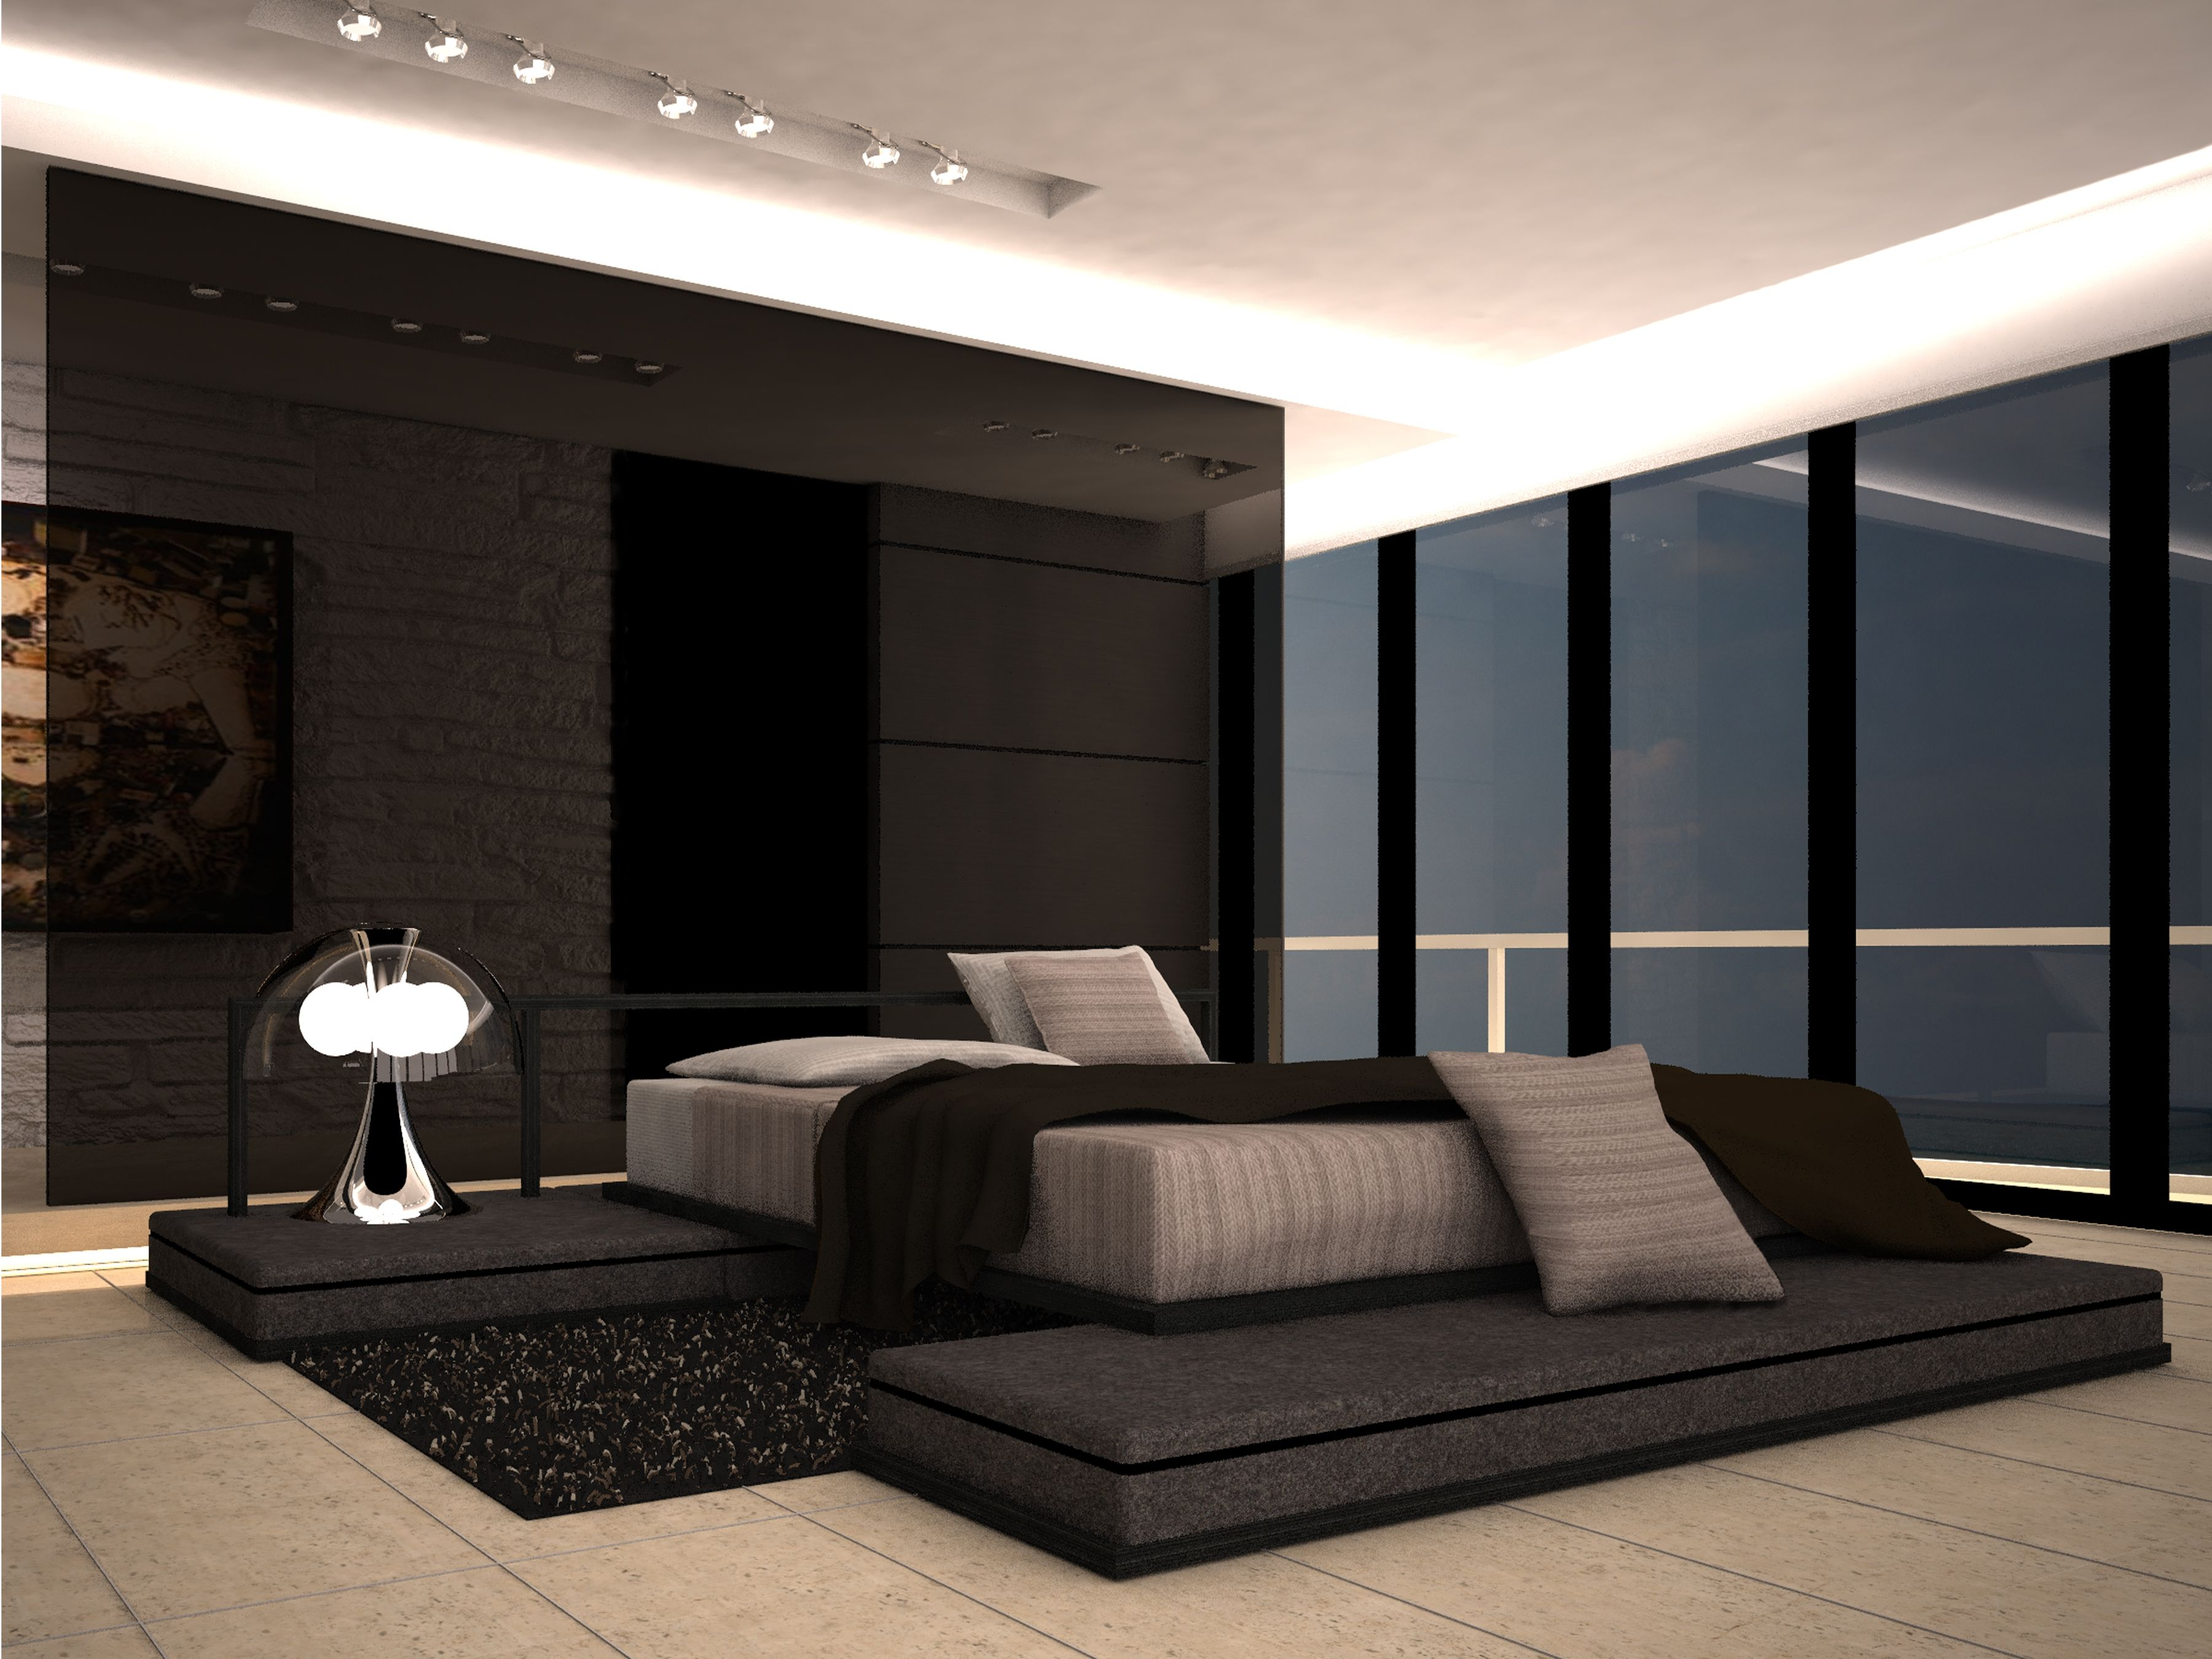 Latest Bed Designs 2016 Part - 15: 17 Best Images About Bed Room Design On Pinterest Luxury Bedroom Design  Royal Bedroom And Bedroom Designs